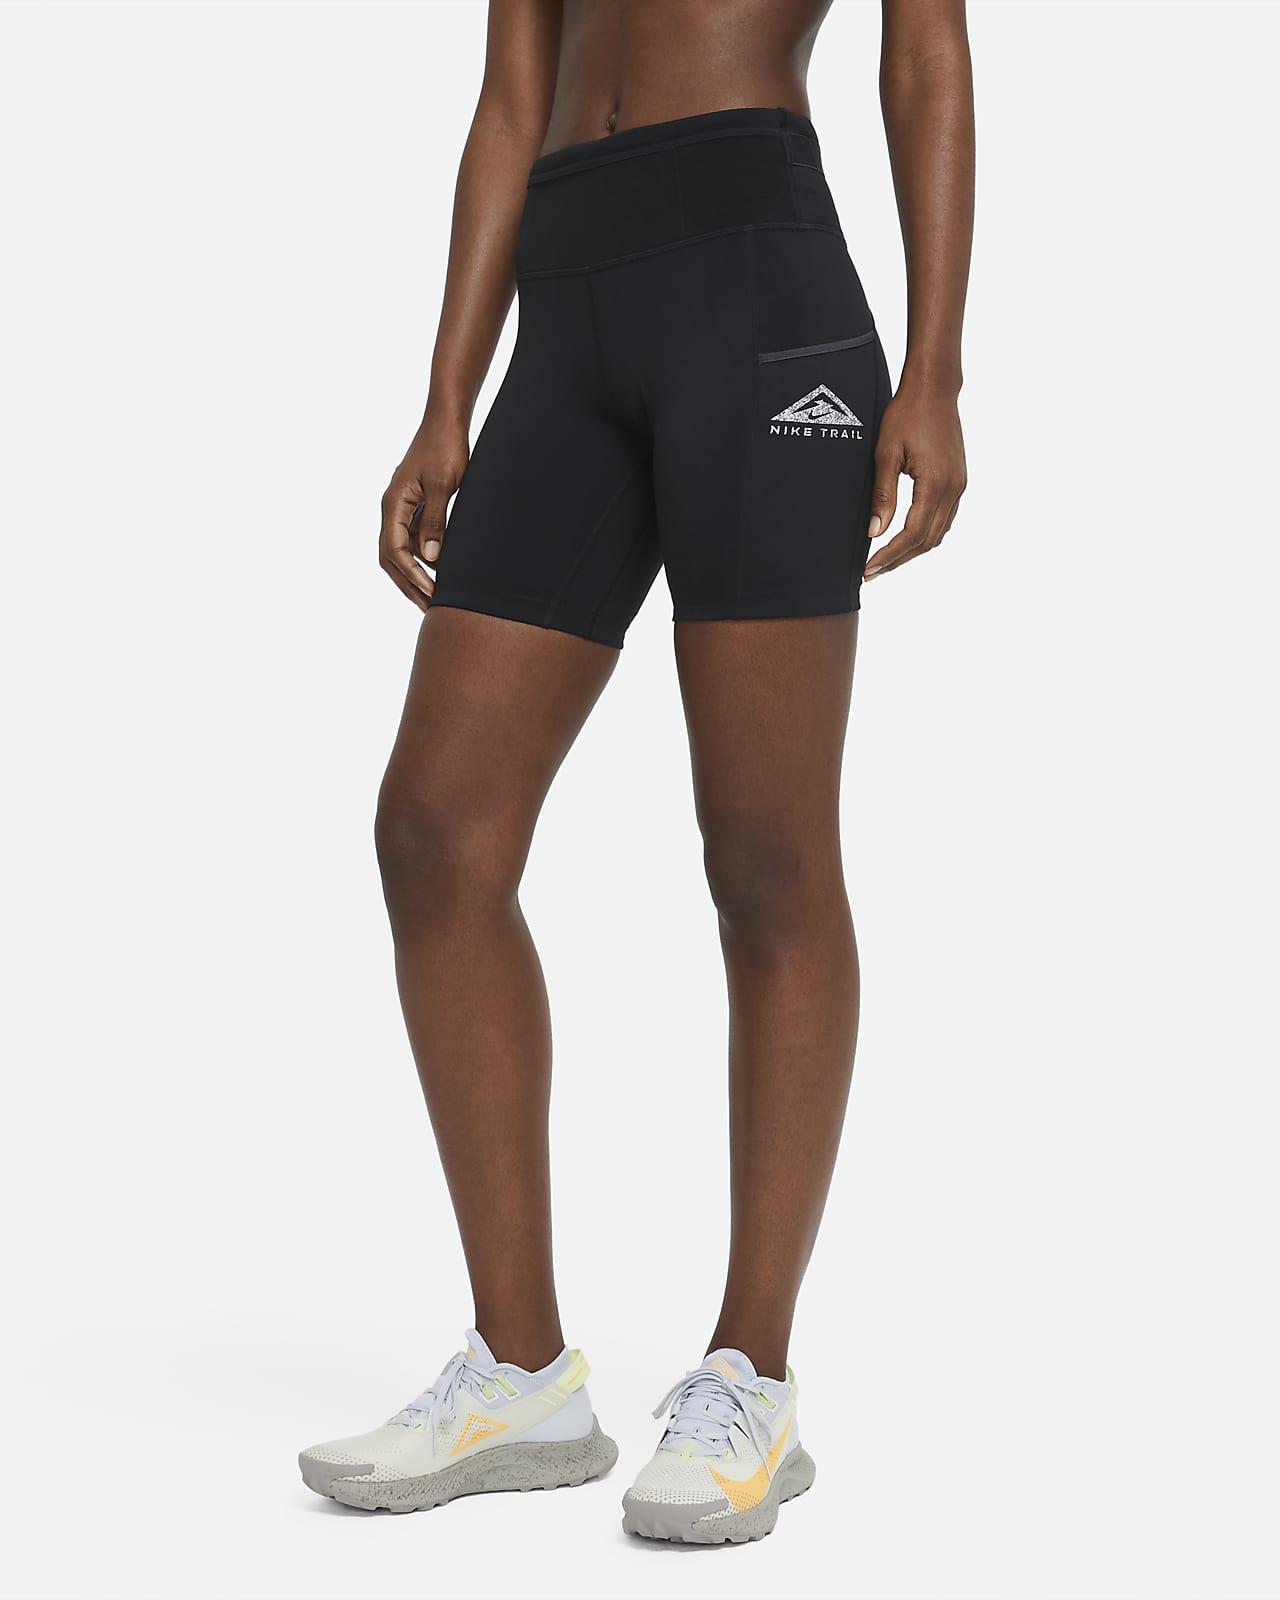 Dámské trailové běžecké kraťasy Nike Epic Luxe